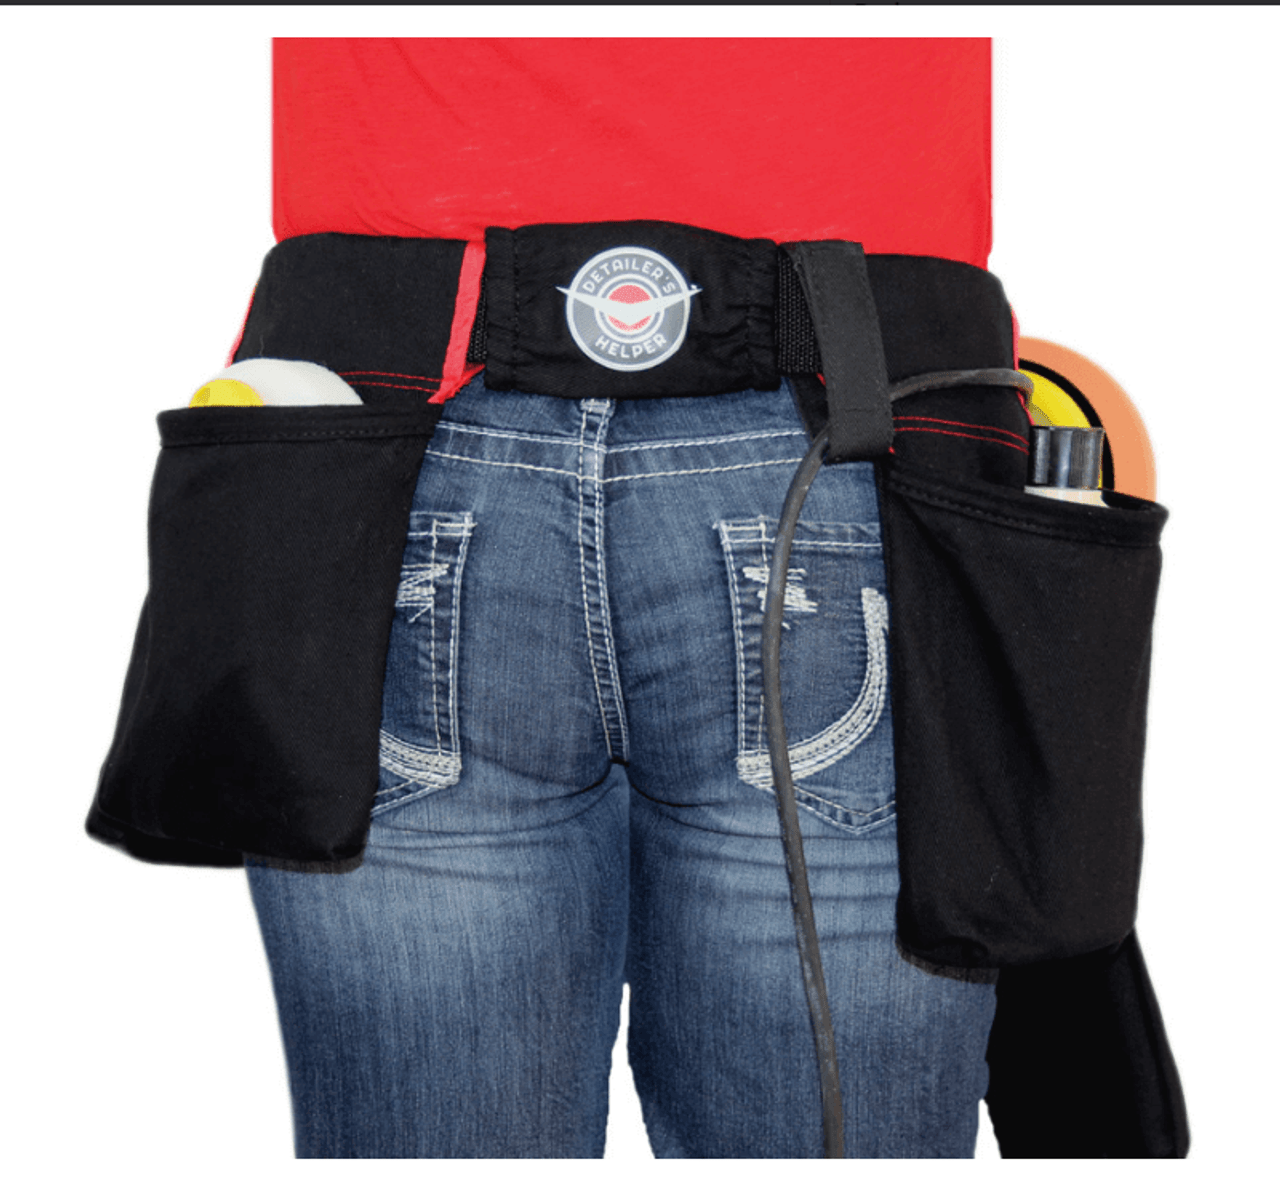 For your waist Detailers Helper Tool Belt A Detailing Necessity!